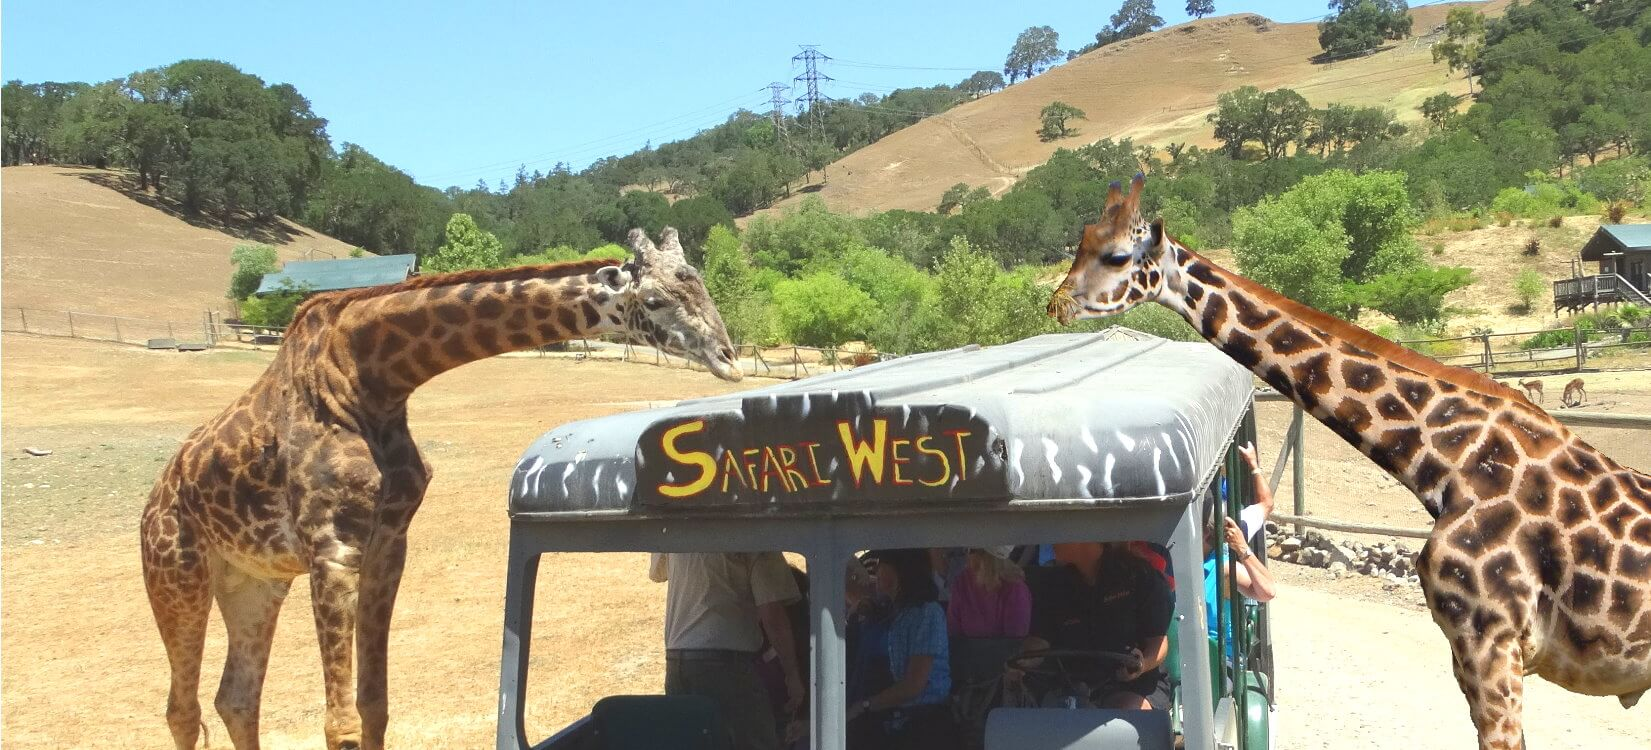 Safar-Animal-Park-Jeep-Tour-Outdoor-Adventures